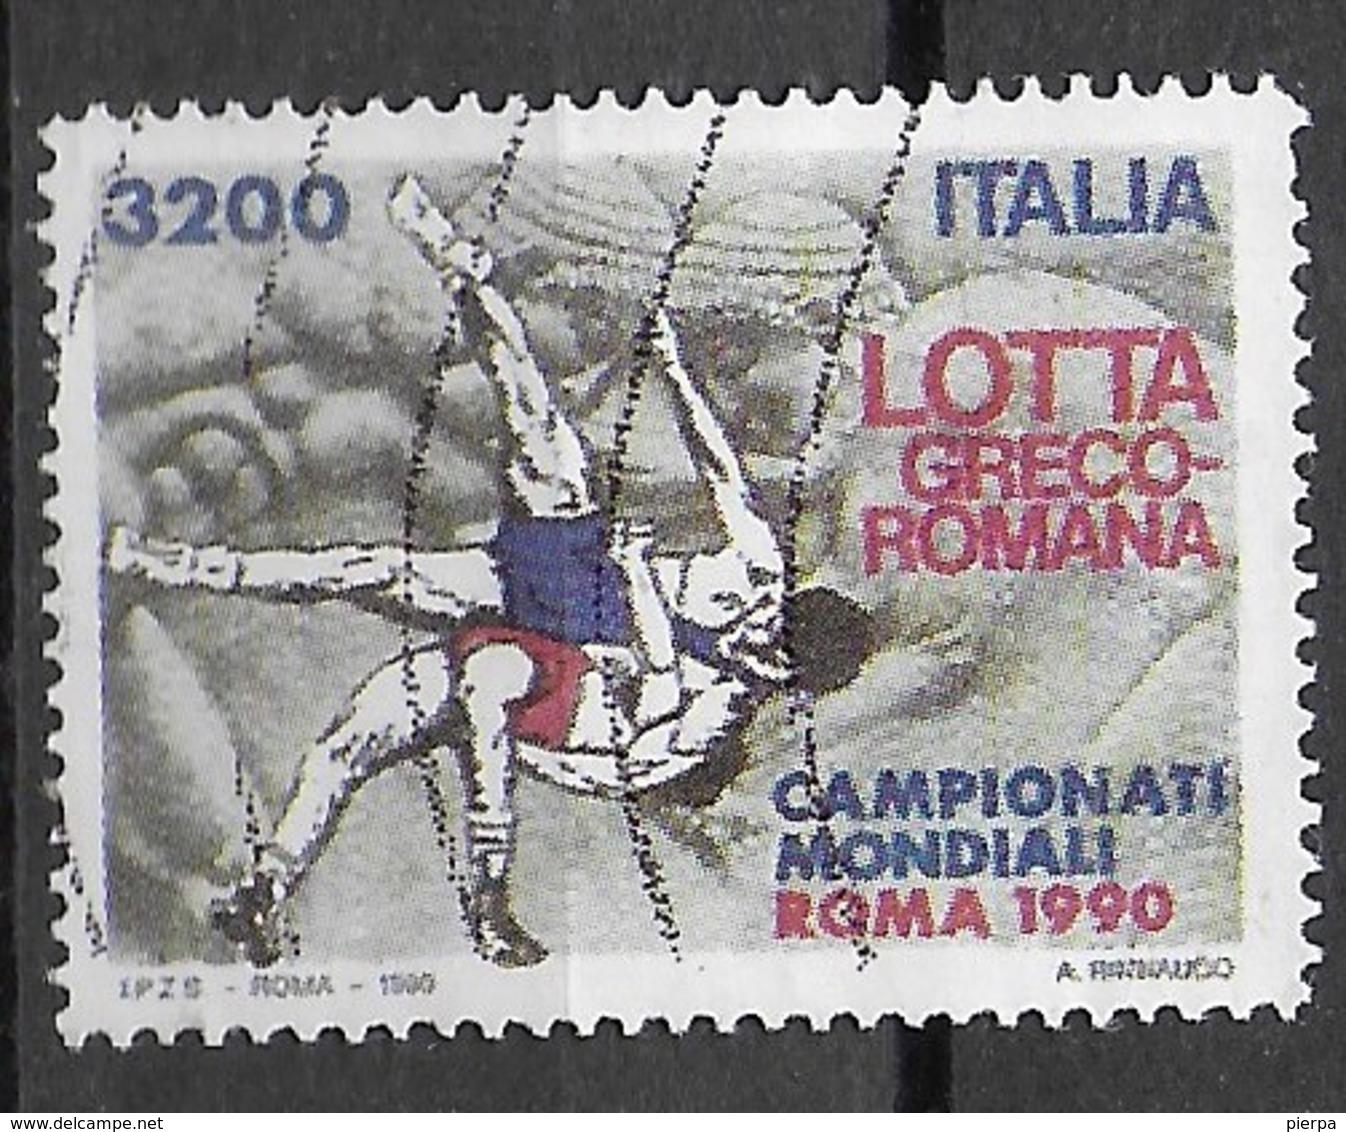 ITALIA - 1990 - LOTTA GRECO ROMANA LIRE 3200 - FALSO PASSATO PER POSTA -DENT- 13 3/4 X 13 3/4 - Variétés Et Curiosités